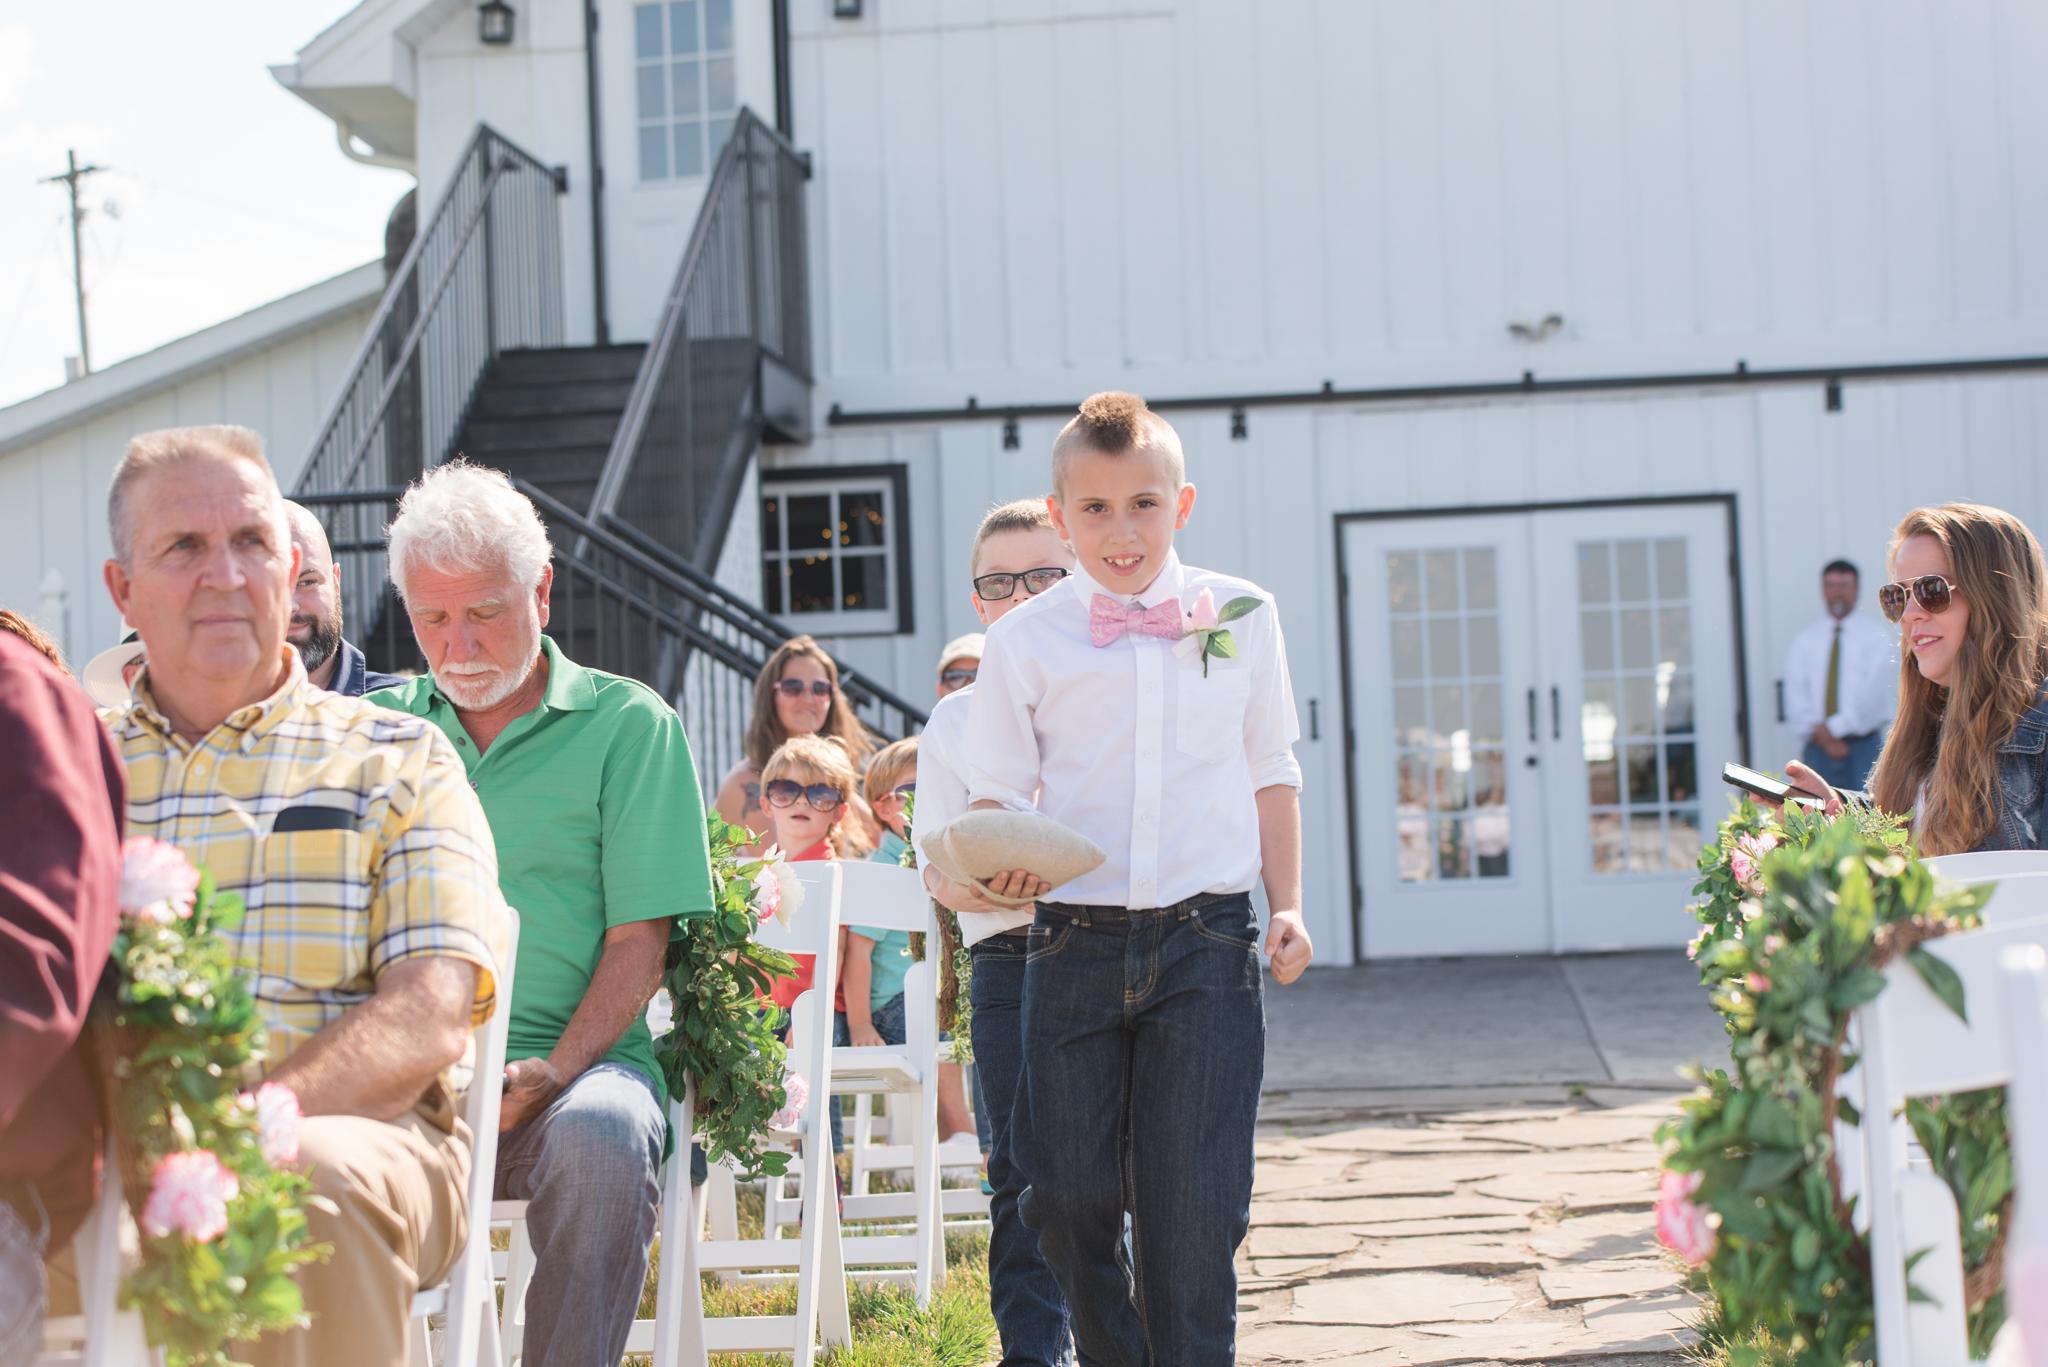 barn wedding, KY wedding, outdoor wedding, Dry Ridge, Lexington, Somerset, Winchester, Mt Sterling, Ashland, West Chester